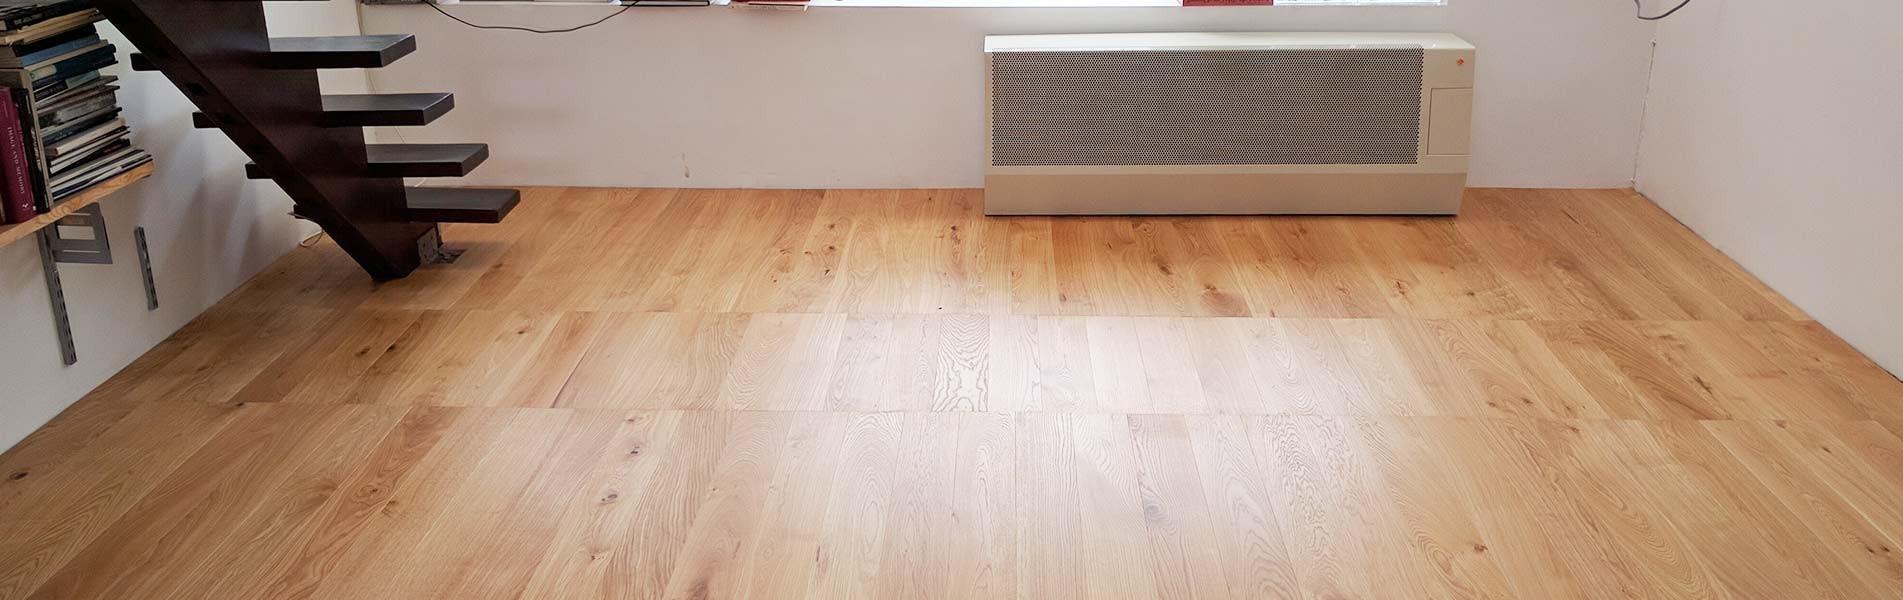 Designed floors